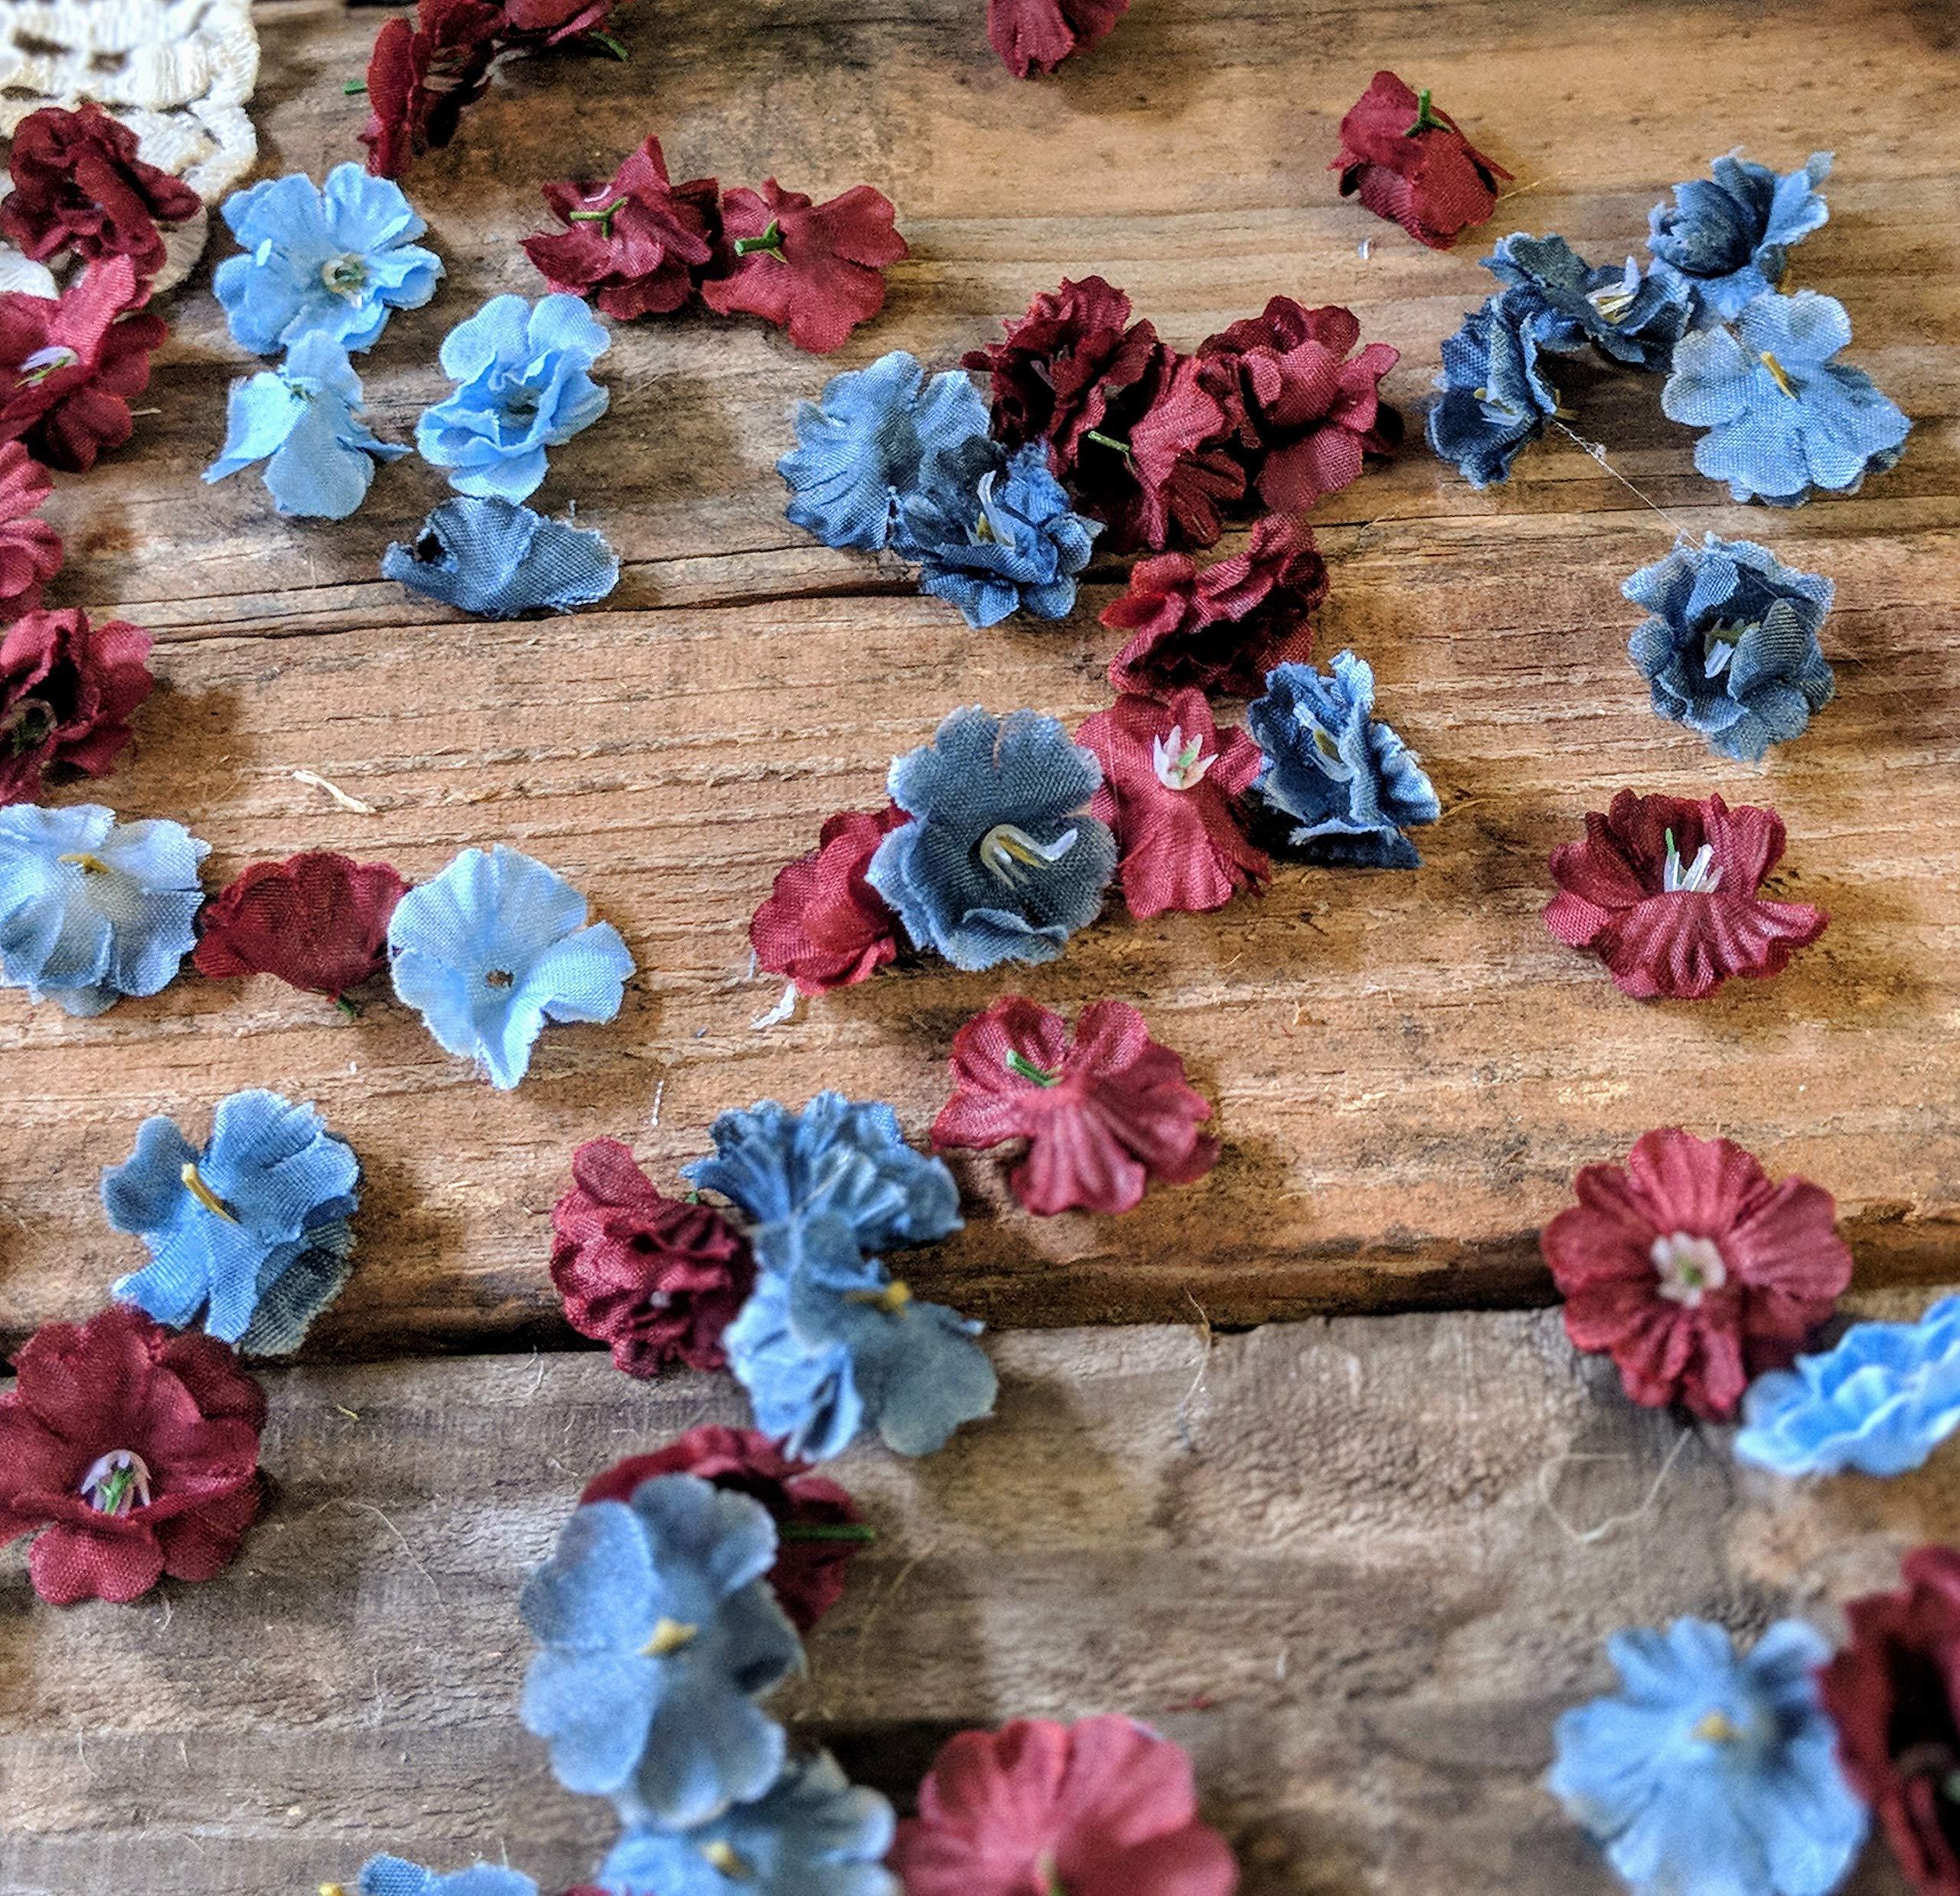 Wedding-Table-Decorations-for-Reception-Flower-Confetti